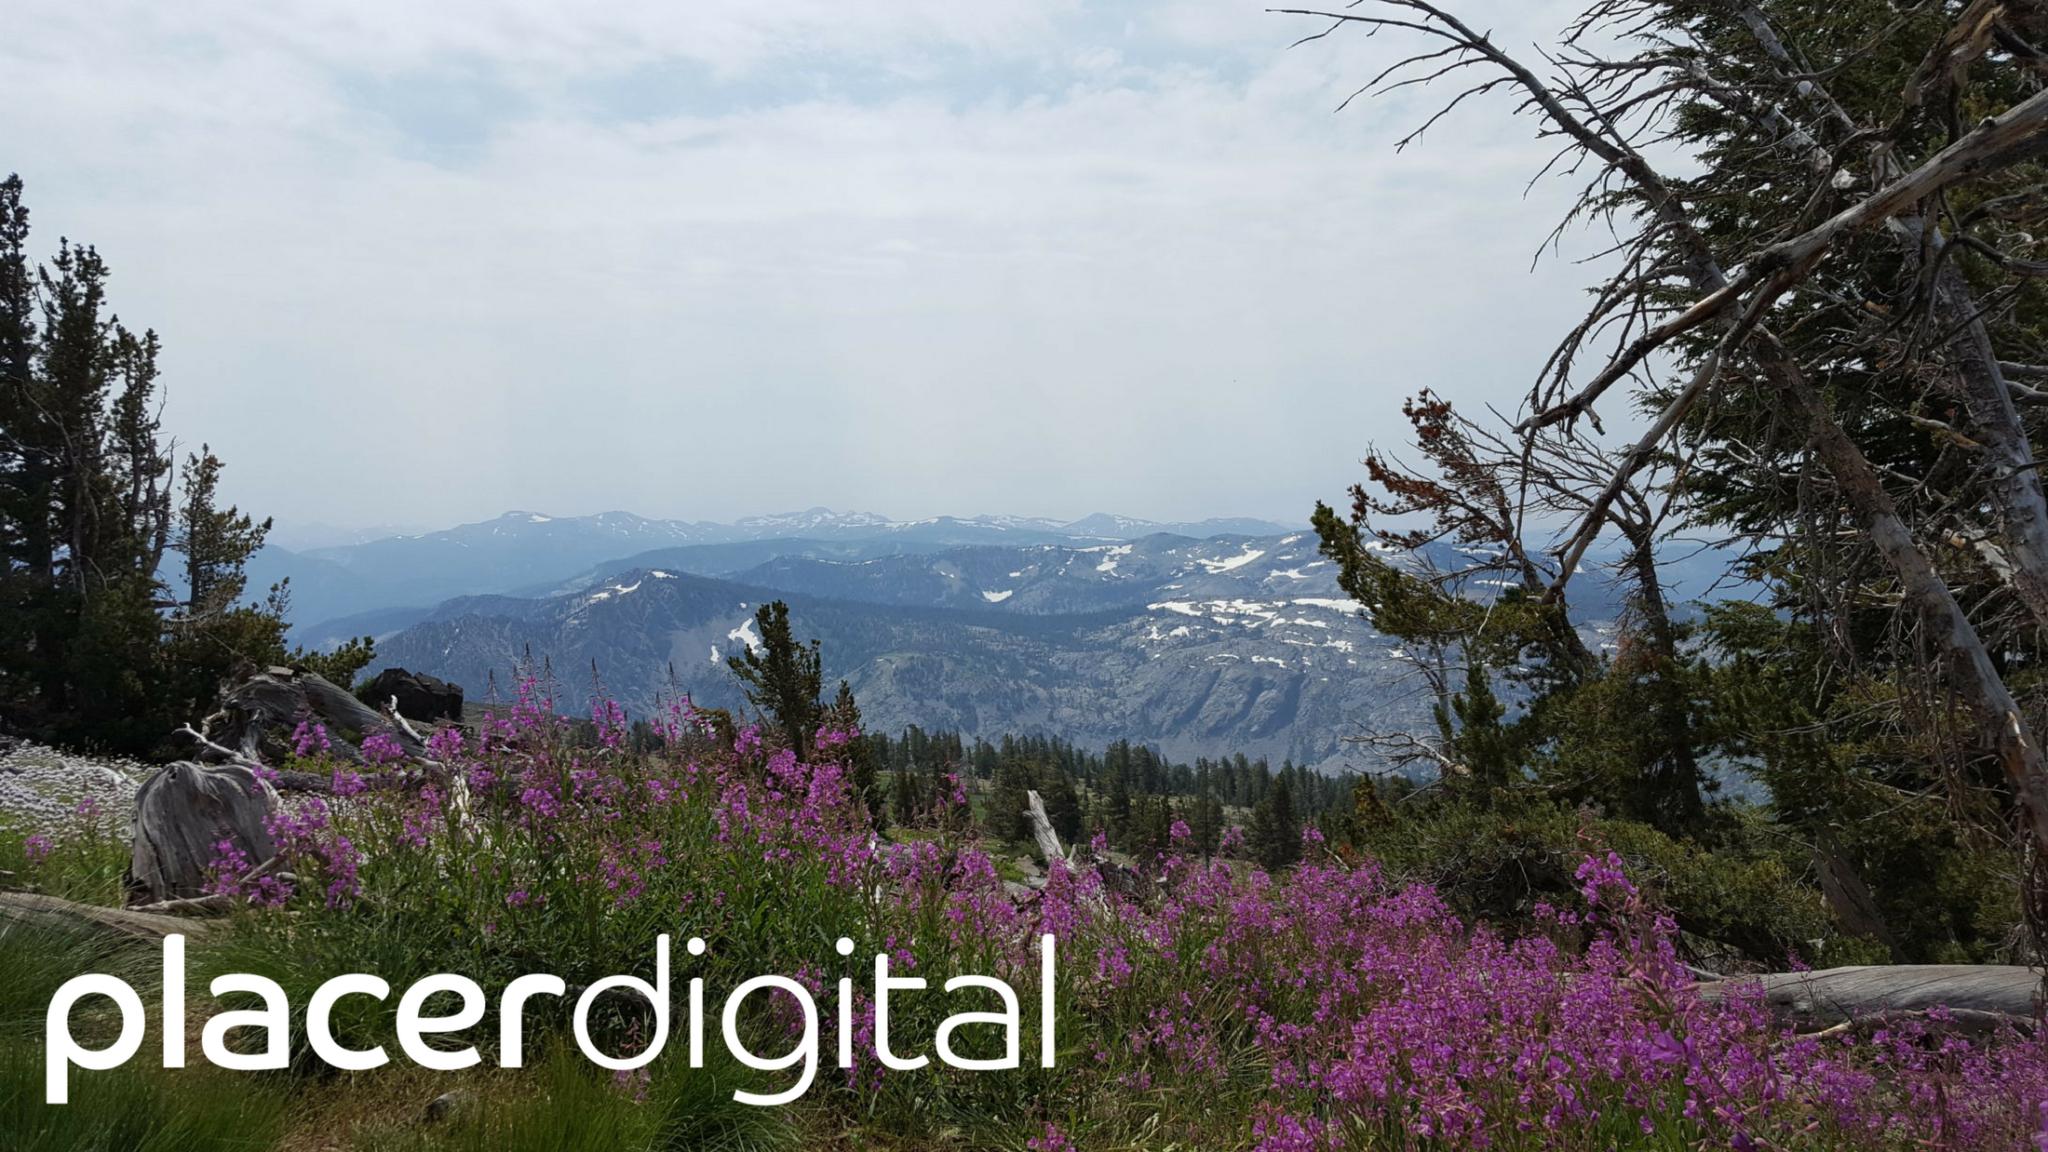 placer digital web design in auburn and roseville